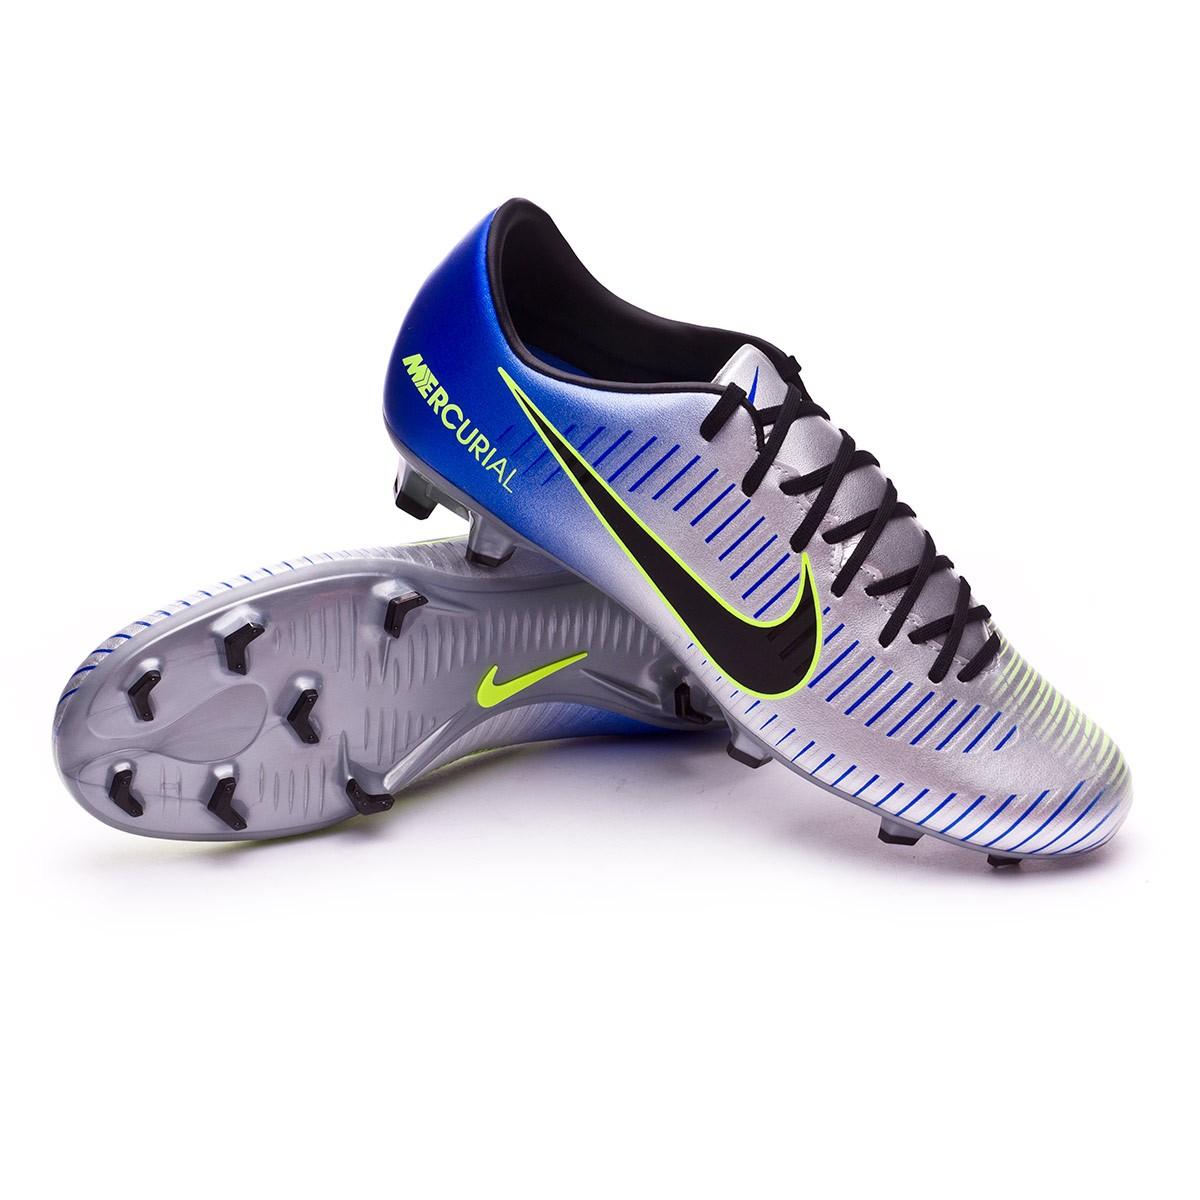 67f47f8ef2 Chuteira Nike Mercurial Victory VI FG Neymar Racer blue-Black-Chrome-Volt -  Loja de futebol Fútbol Emotion